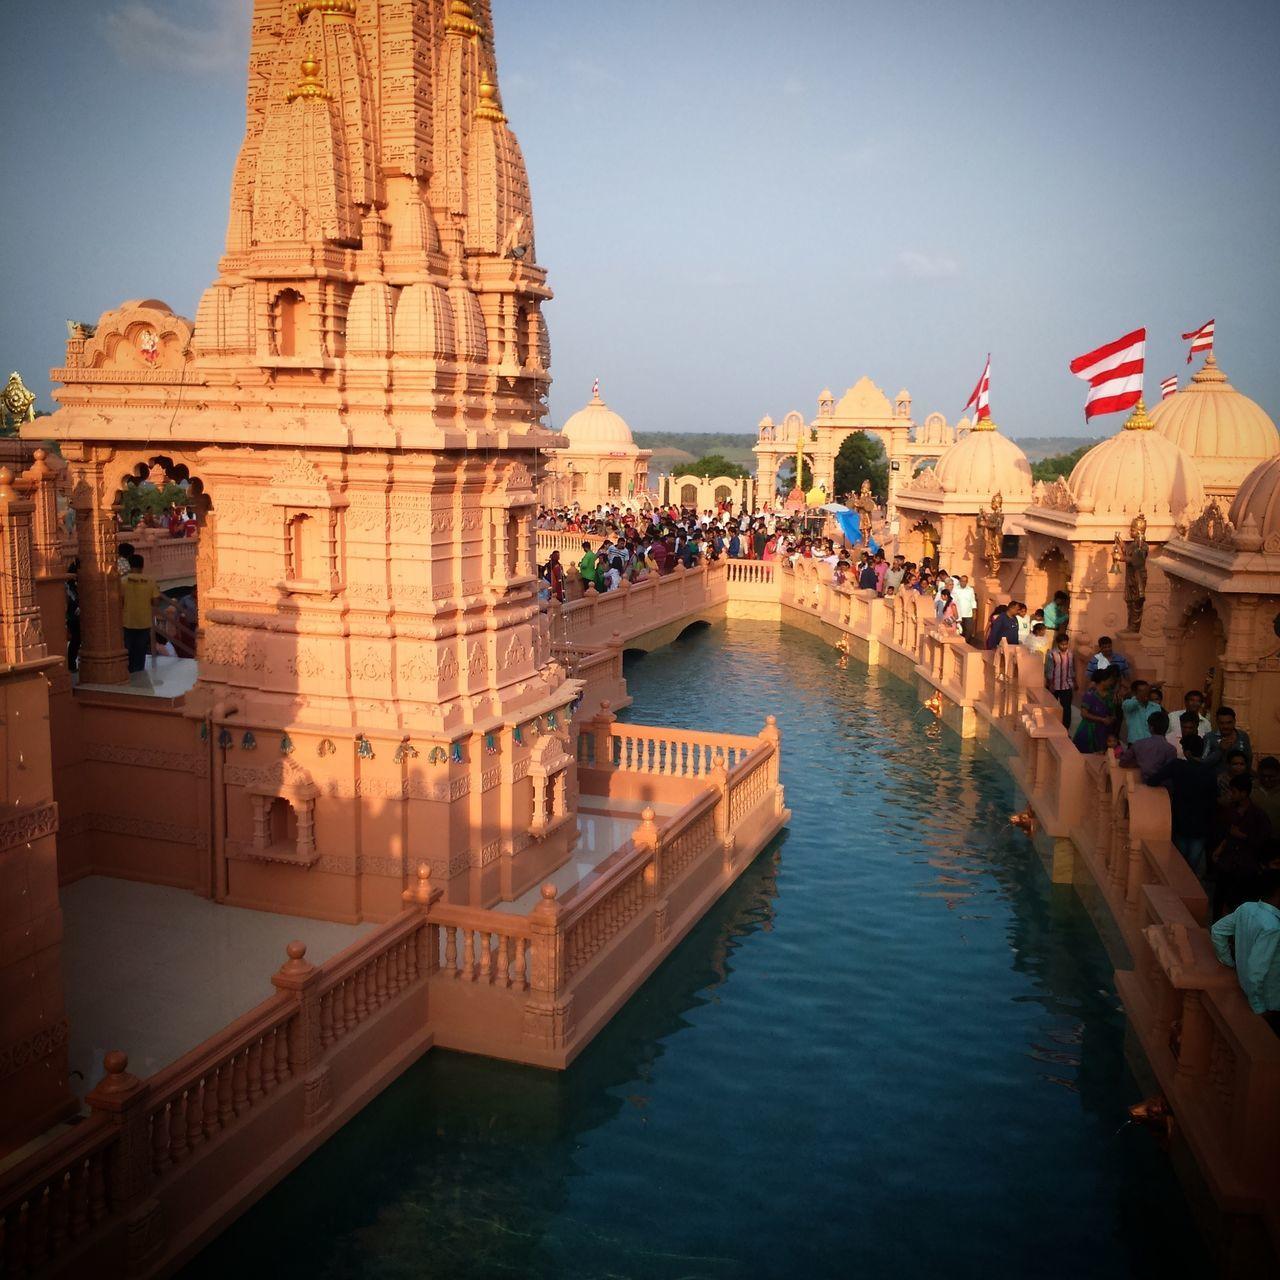 At poicha, Gujarat , India..... Village Temple - Building Temple Poichatemple Poicha Gujarat Gujarattourism India Incredible India Incredibleindiaofficial Tourism Enjoying Life